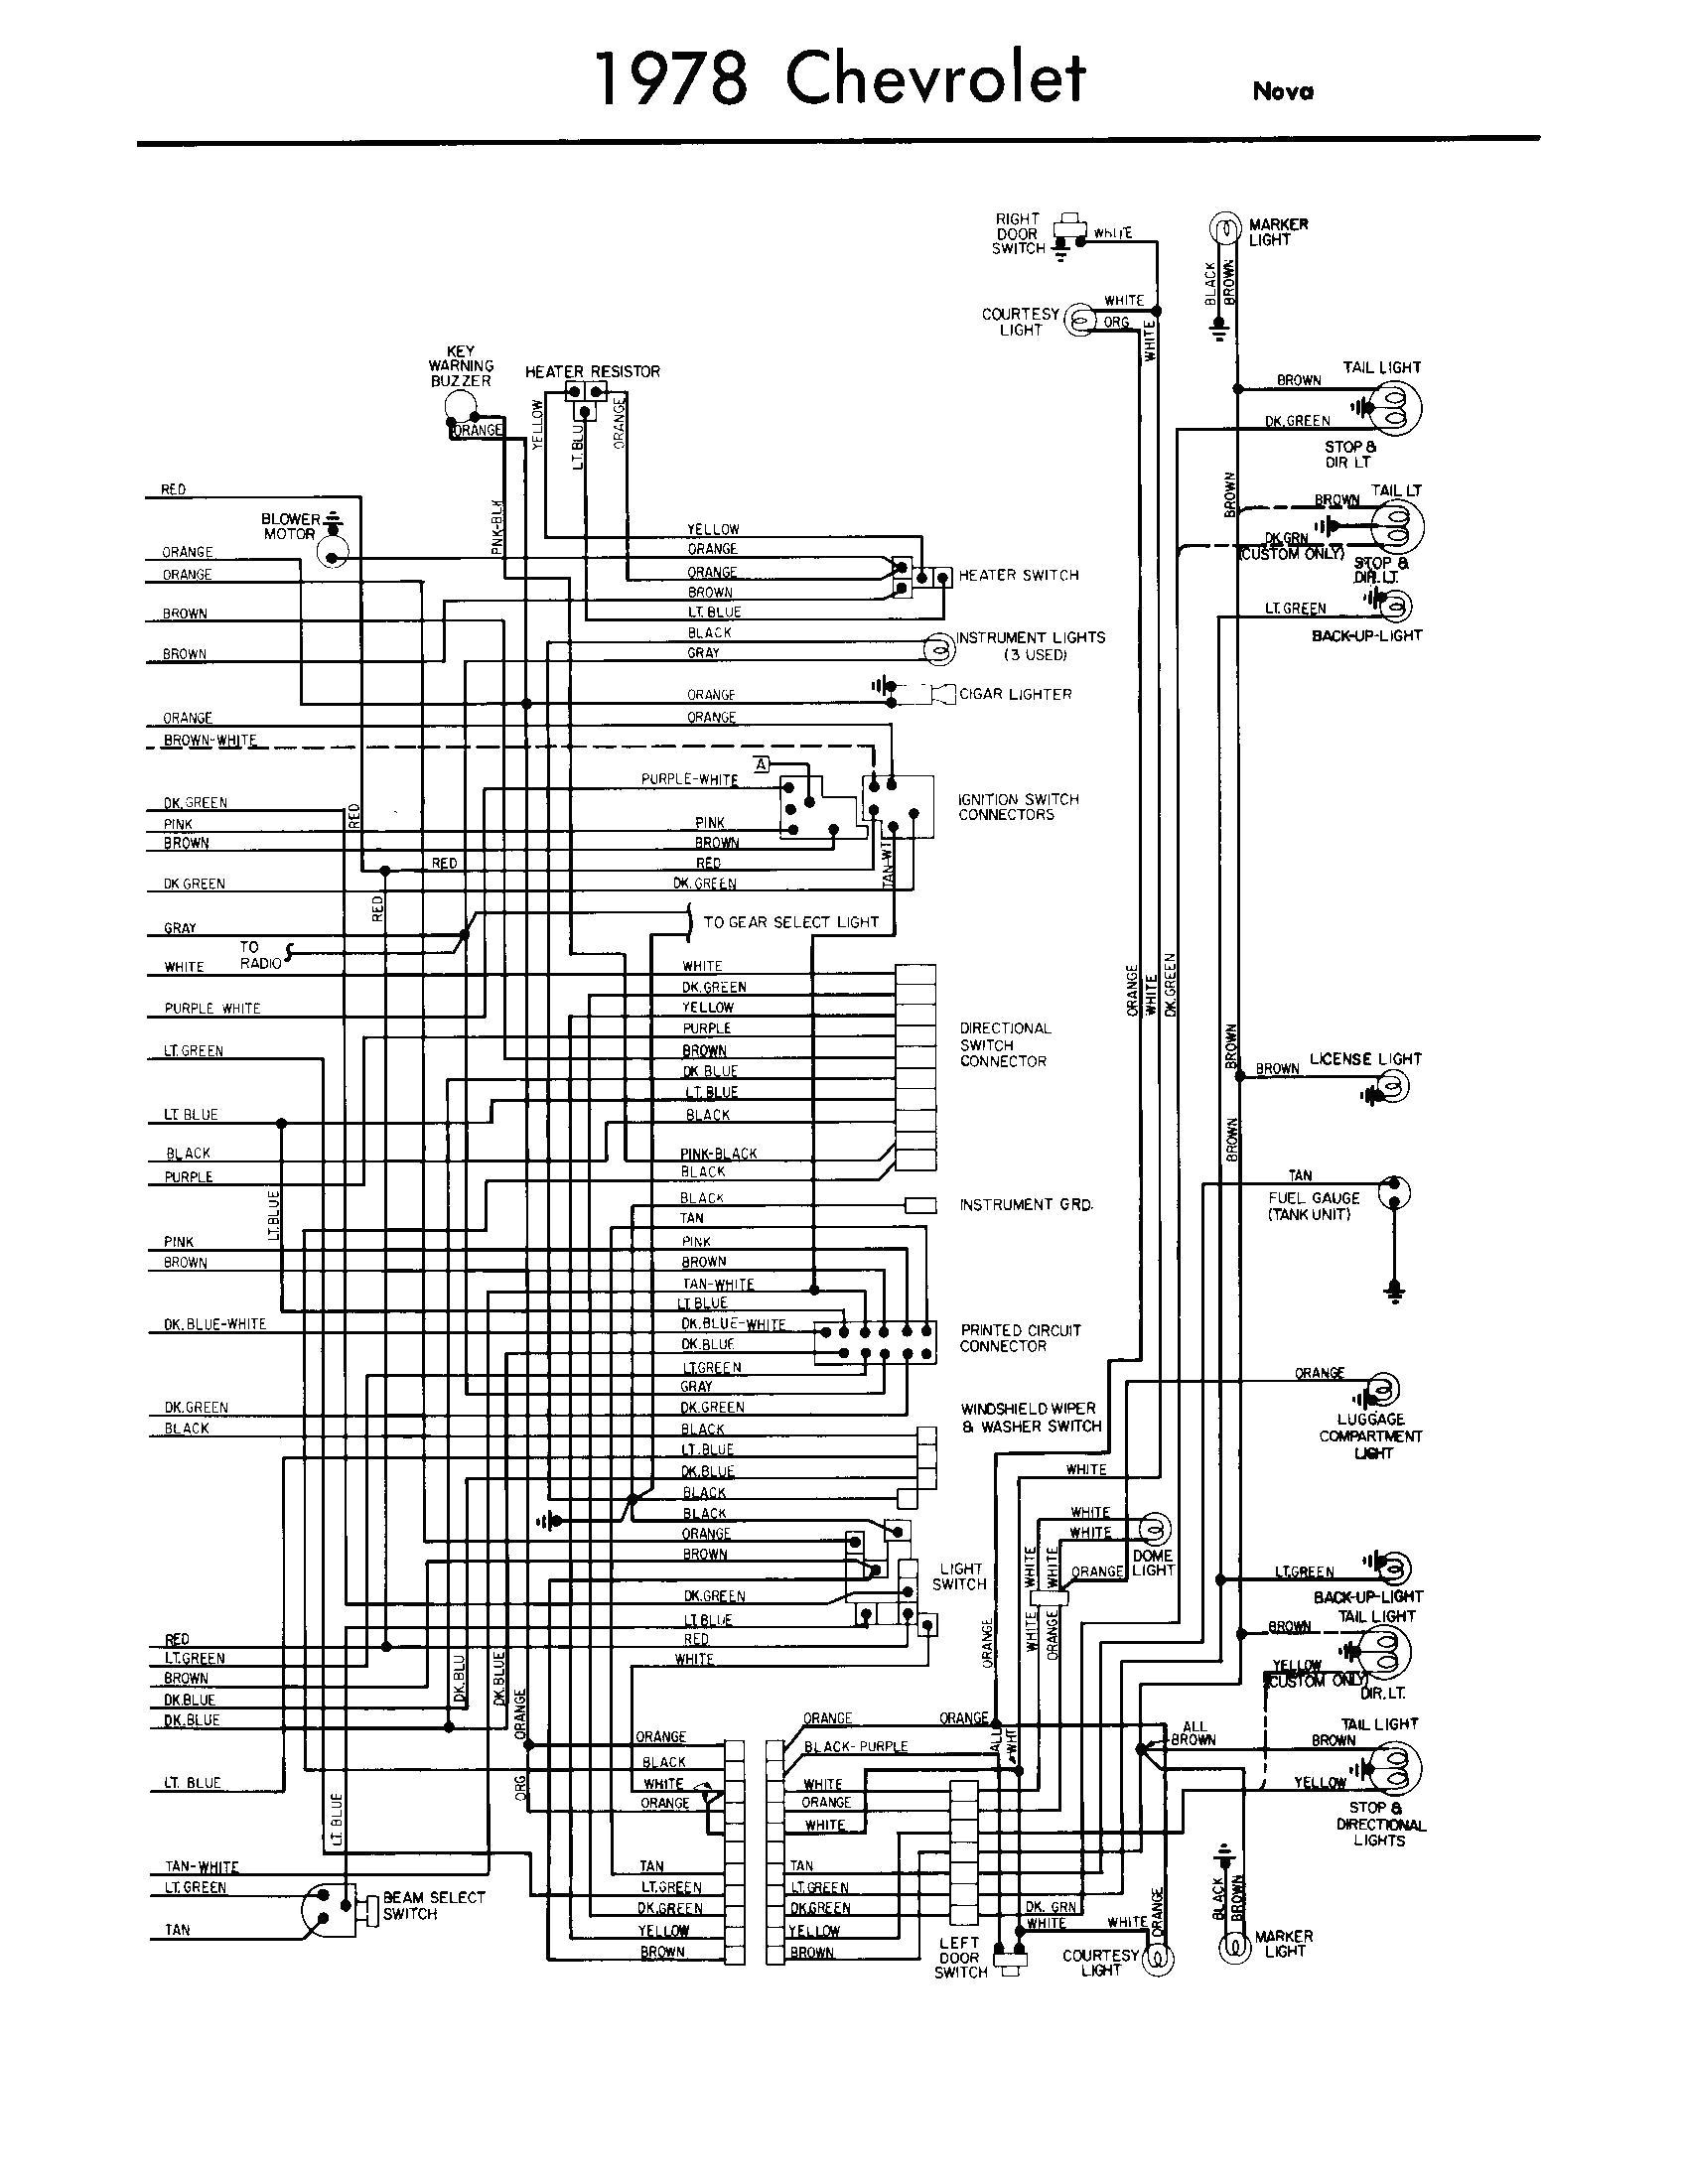 1976 chevy truck vacuum diagrams 1976 circuit diagrams wiring 1976 chevy plug wiring diagram schematic